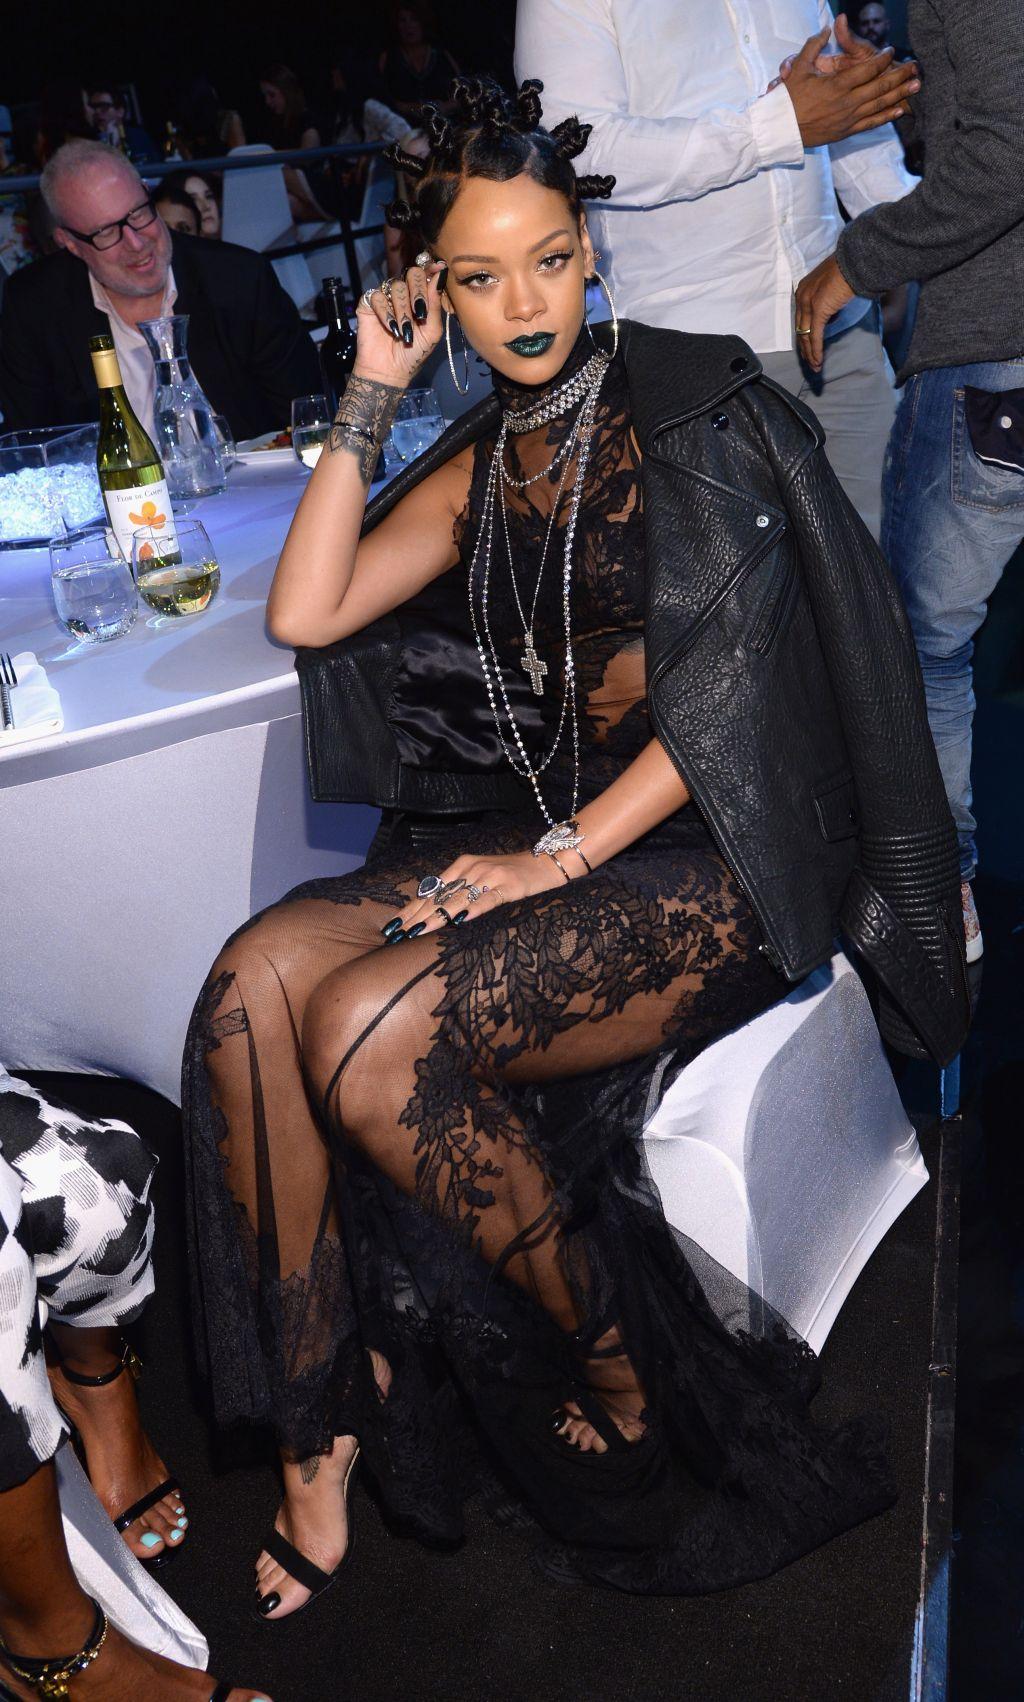 NBC's '2014 iHeartRadio Music Awards' - Roaming Show